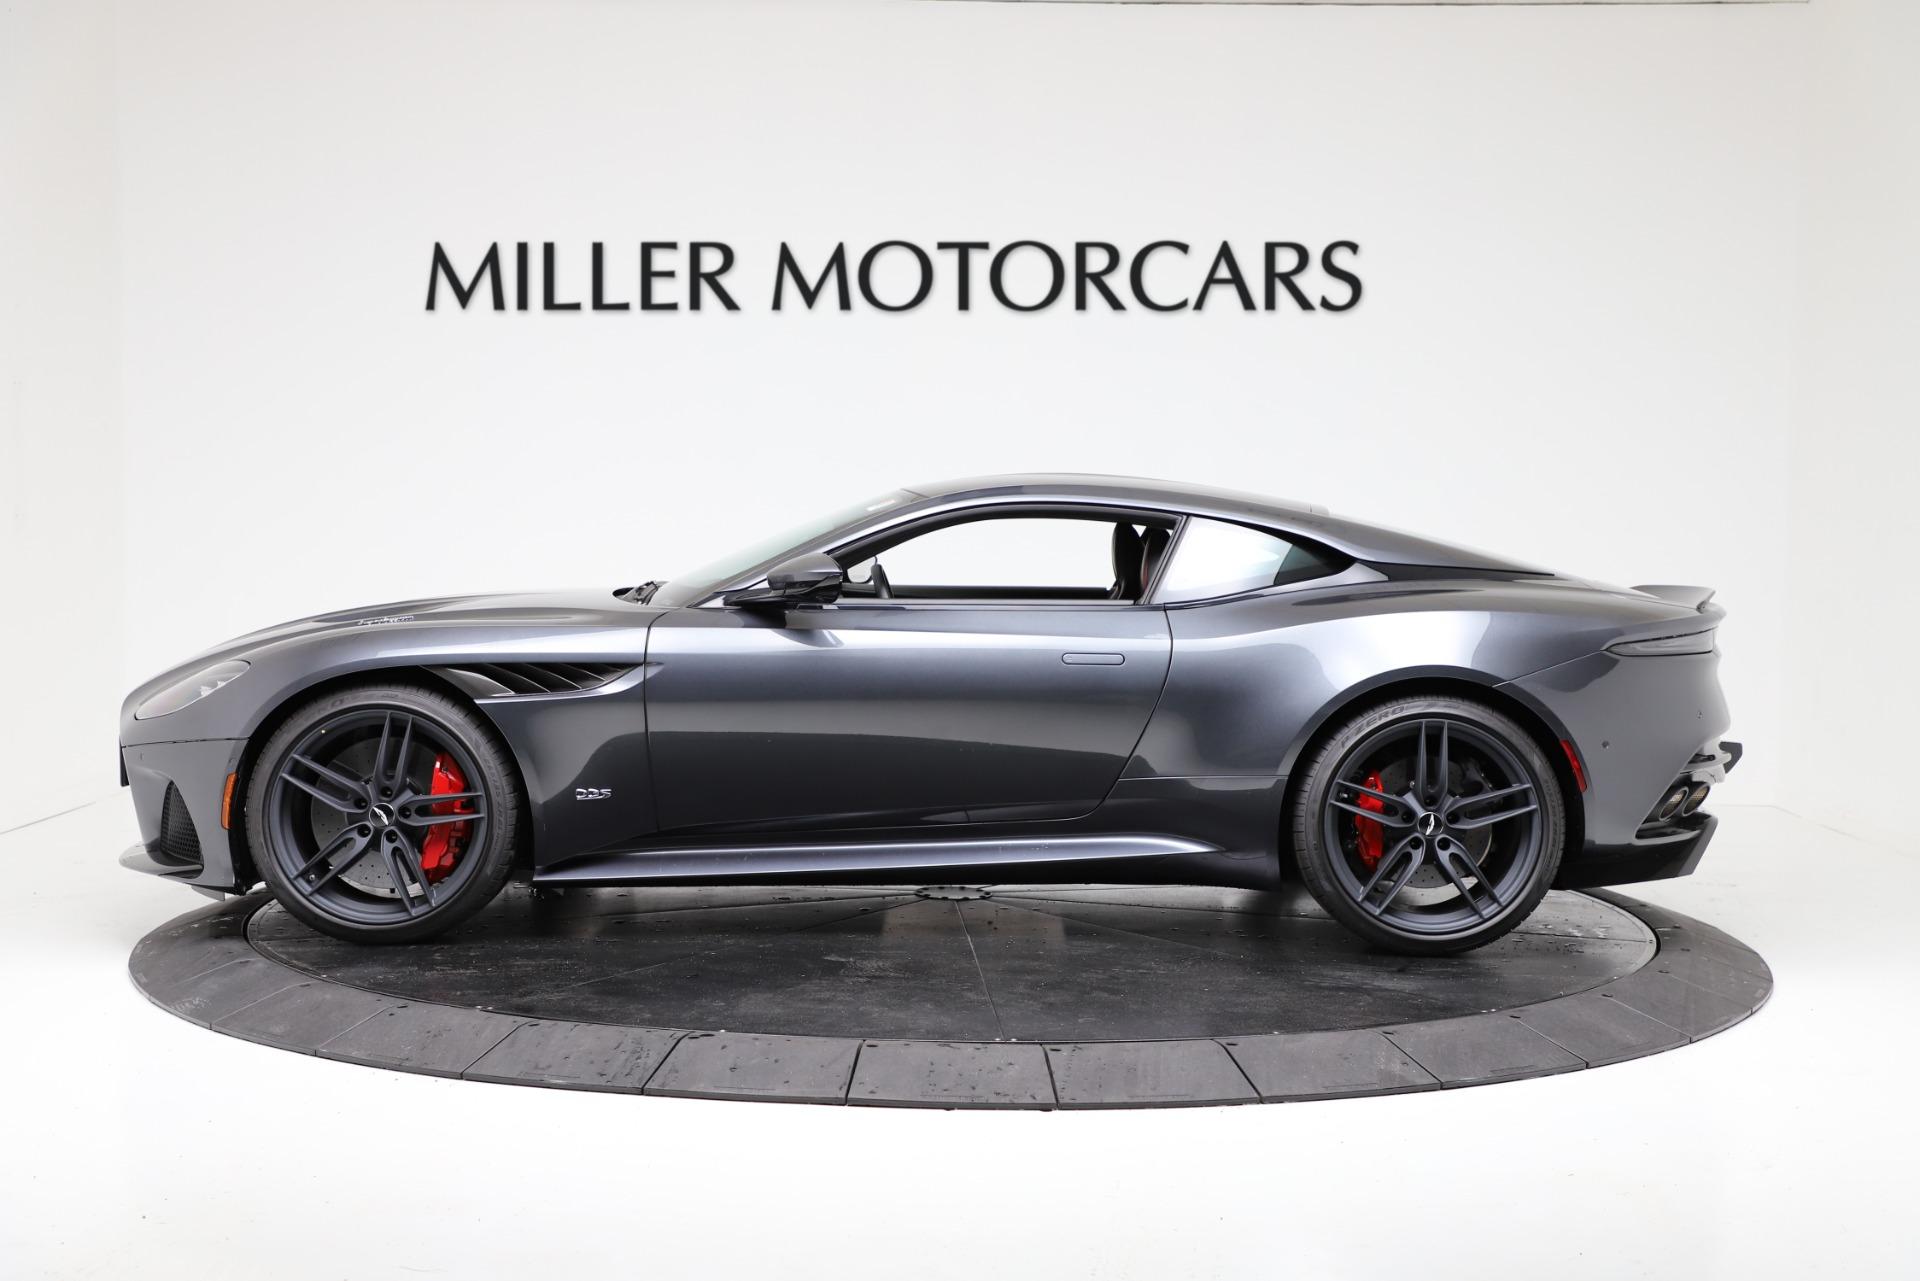 New 2019 Aston Martin DBS Superleggera Coupe For Sale In Greenwich, CT 3318_p3